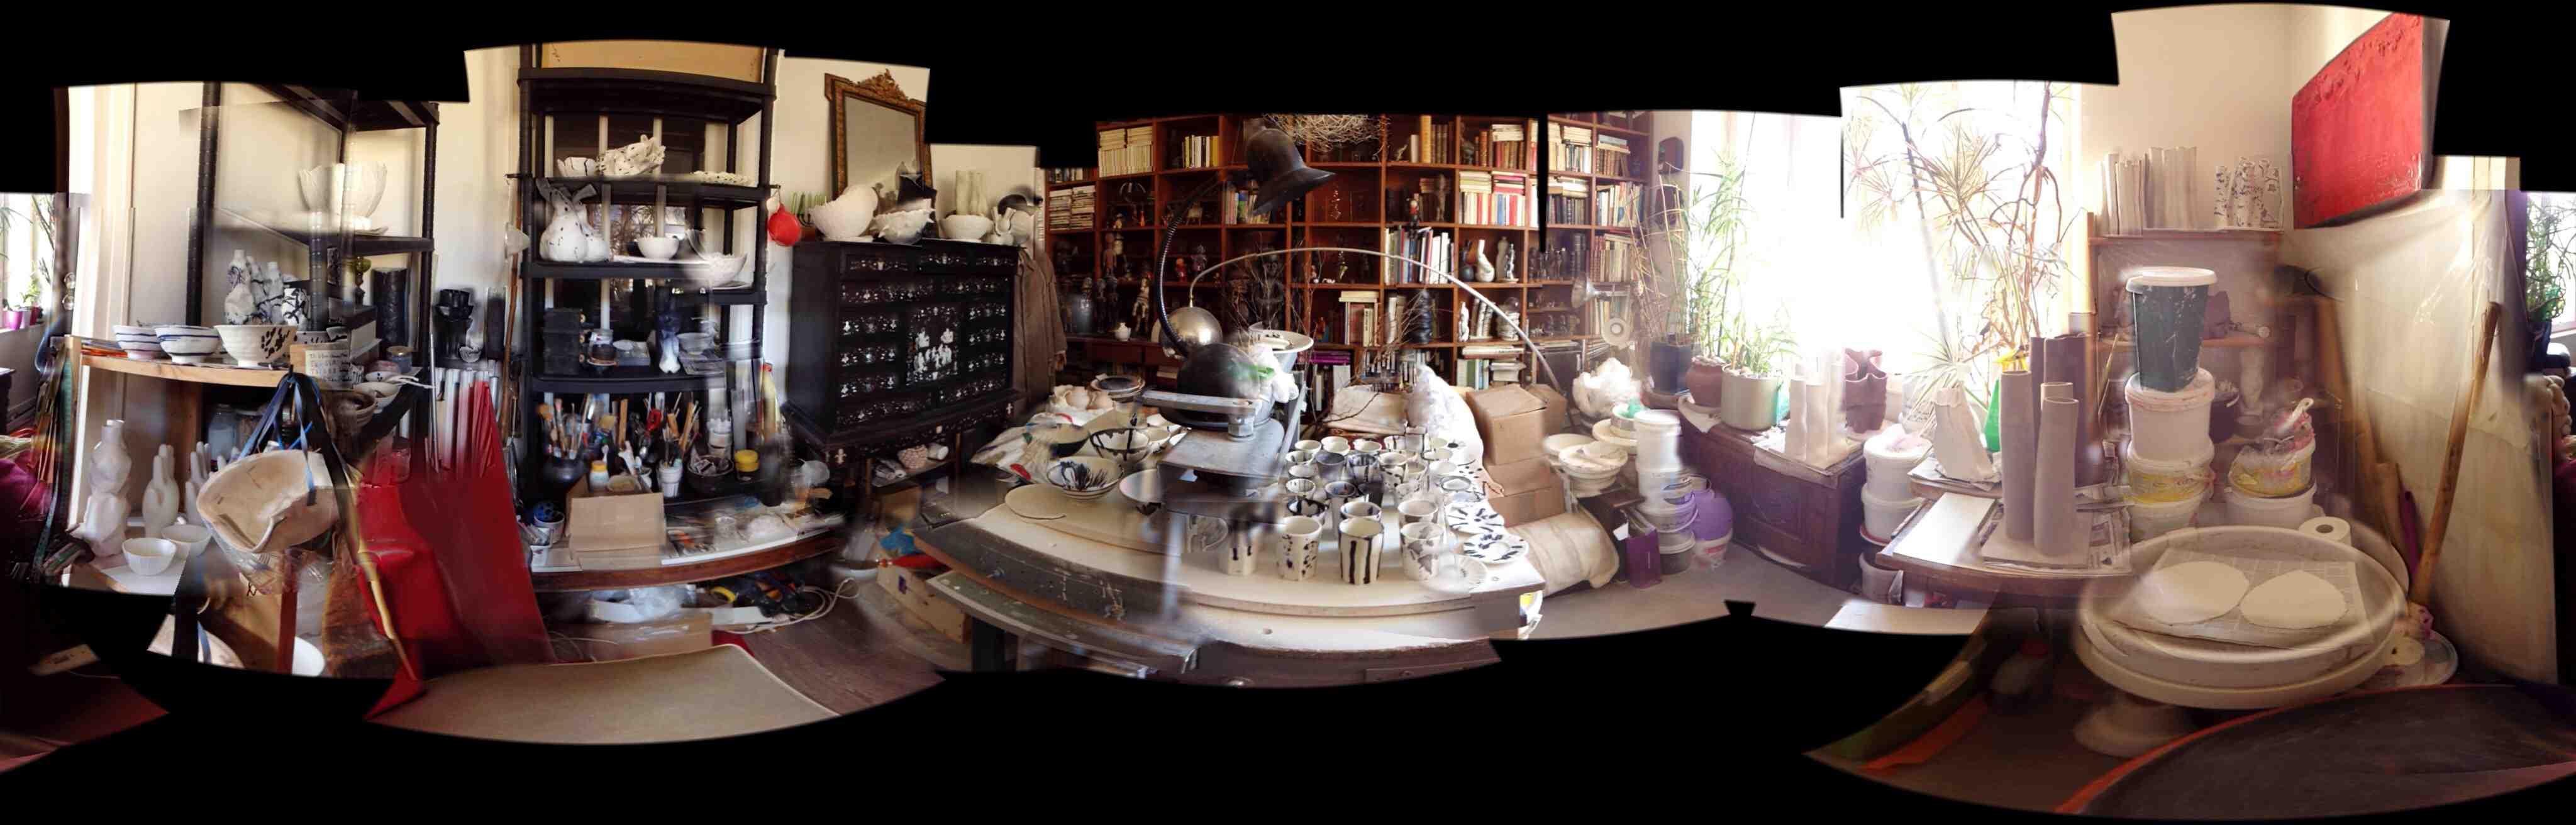 cat-trochu-ceramic-rennes- atelier 1